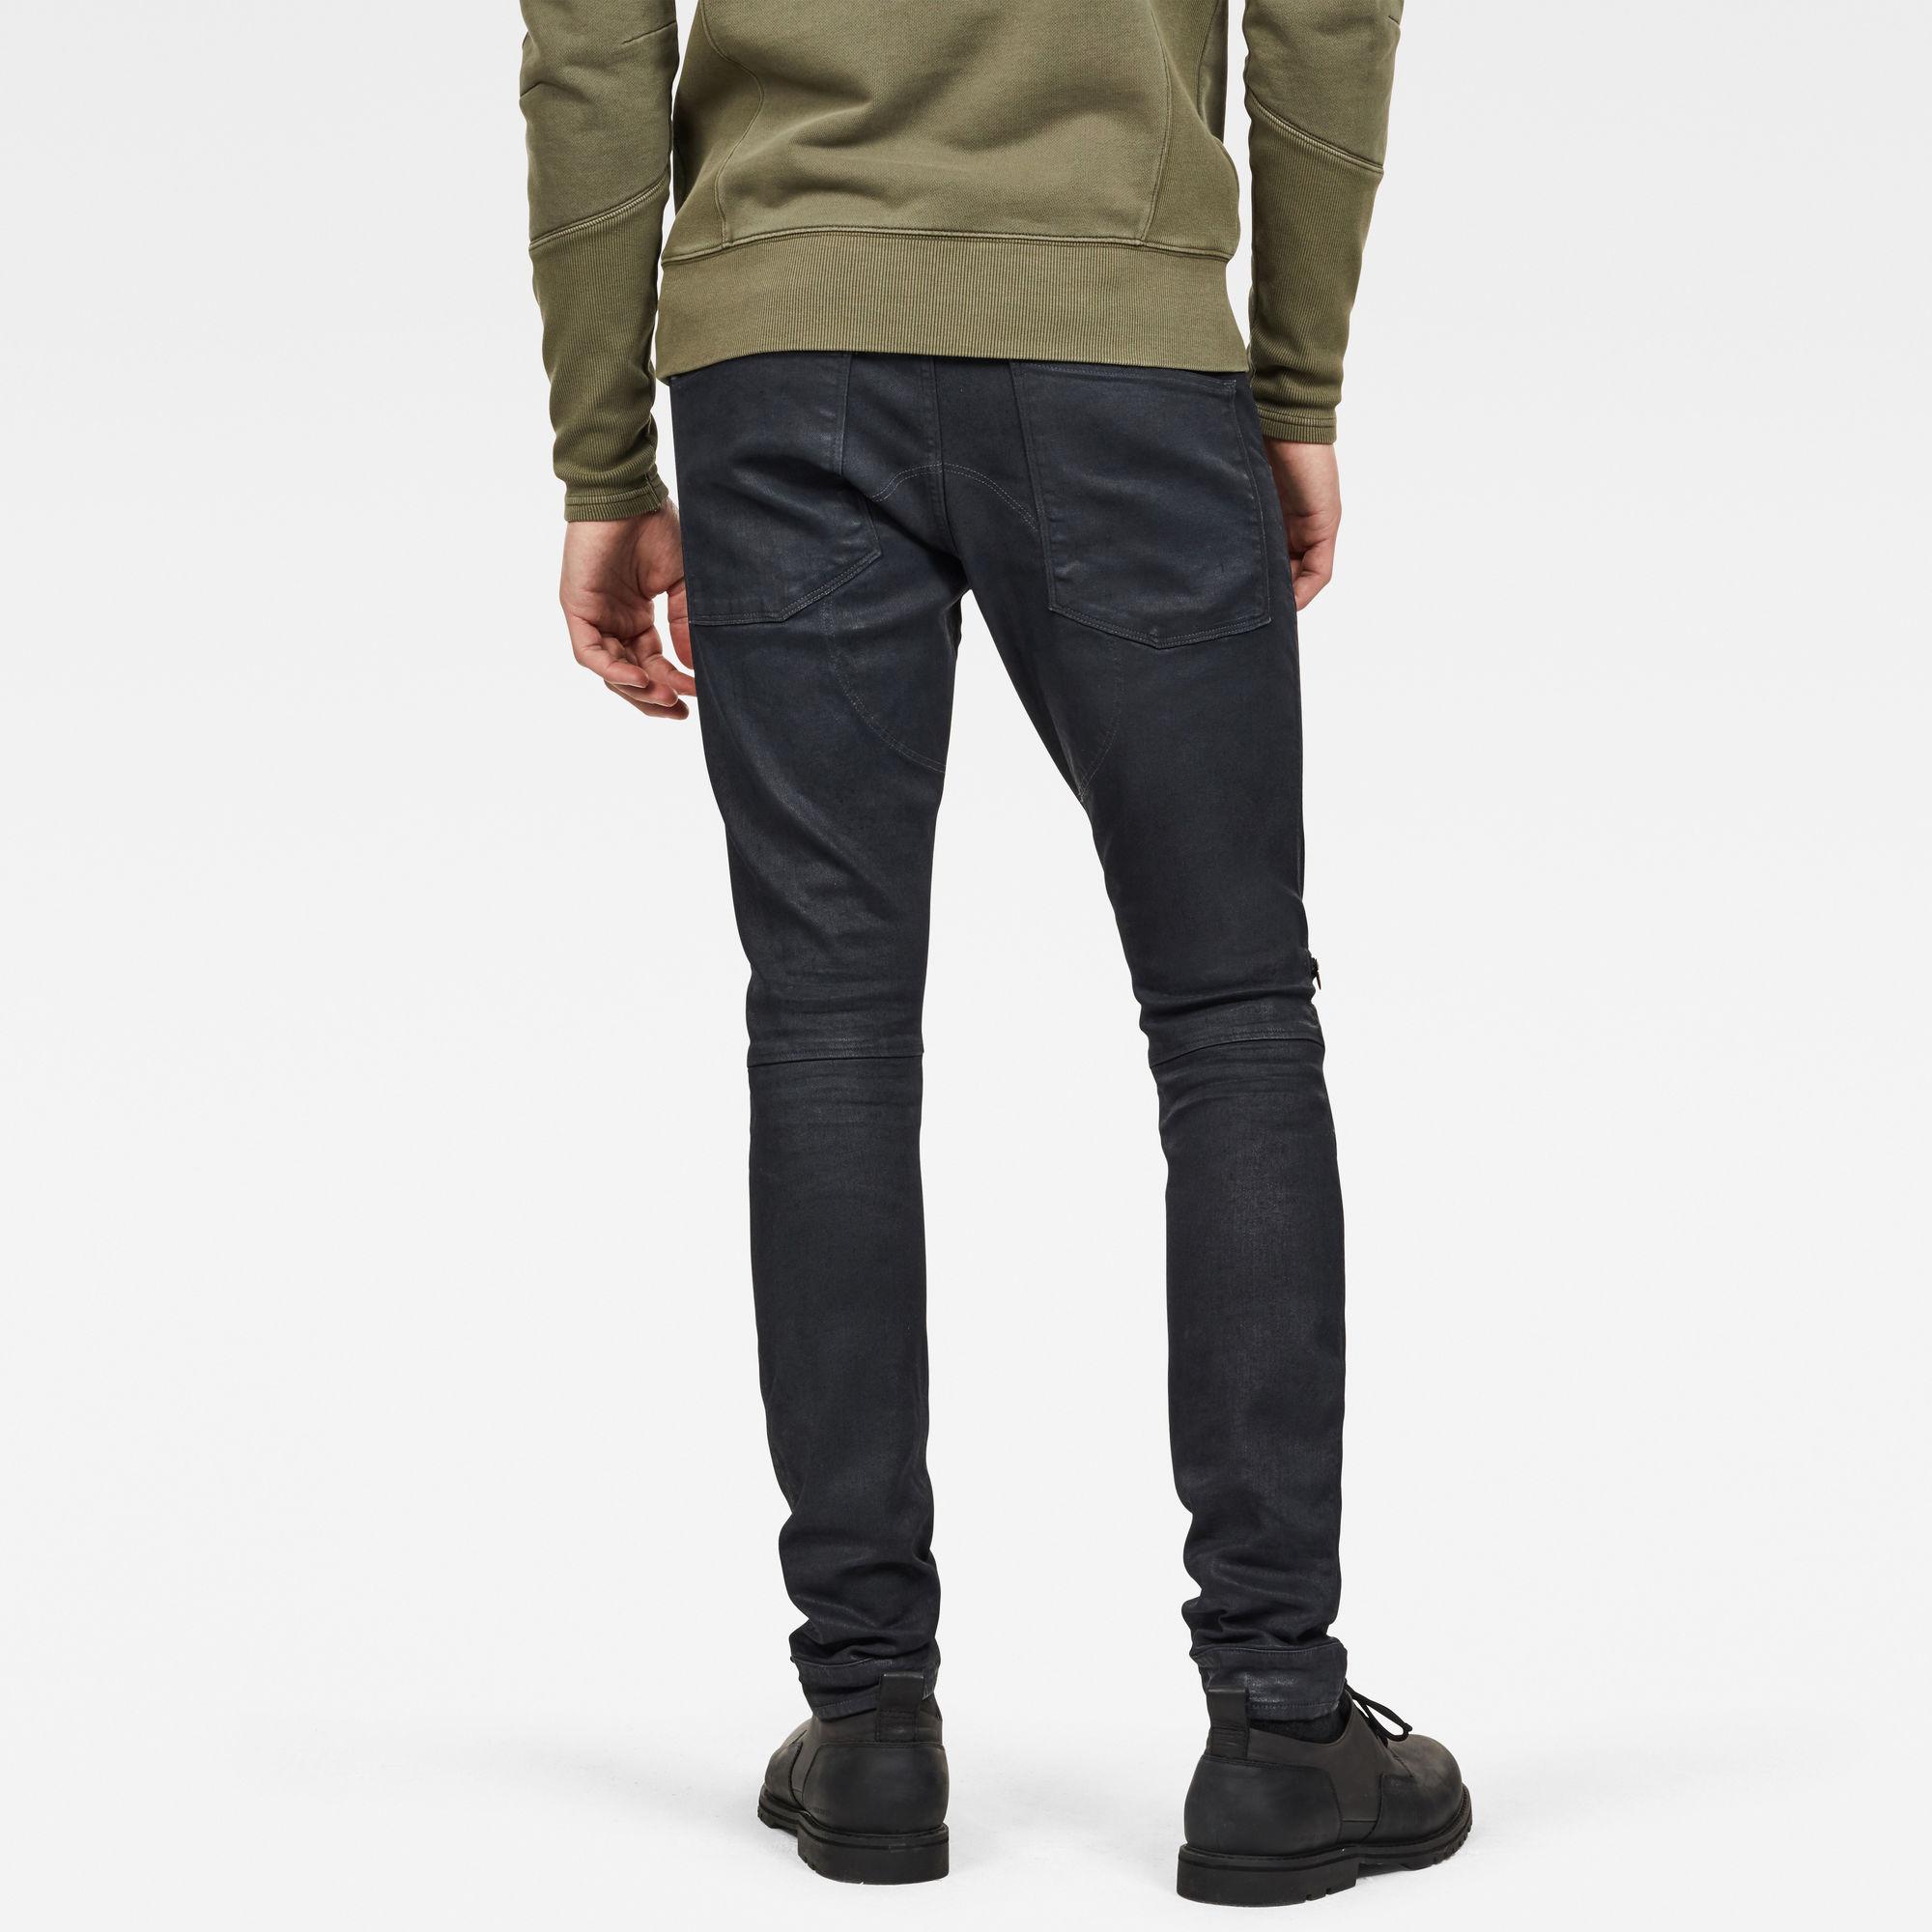 G-Star RAW 5620 G-Star Elwood 3D Zip Knee Skinny Jeans